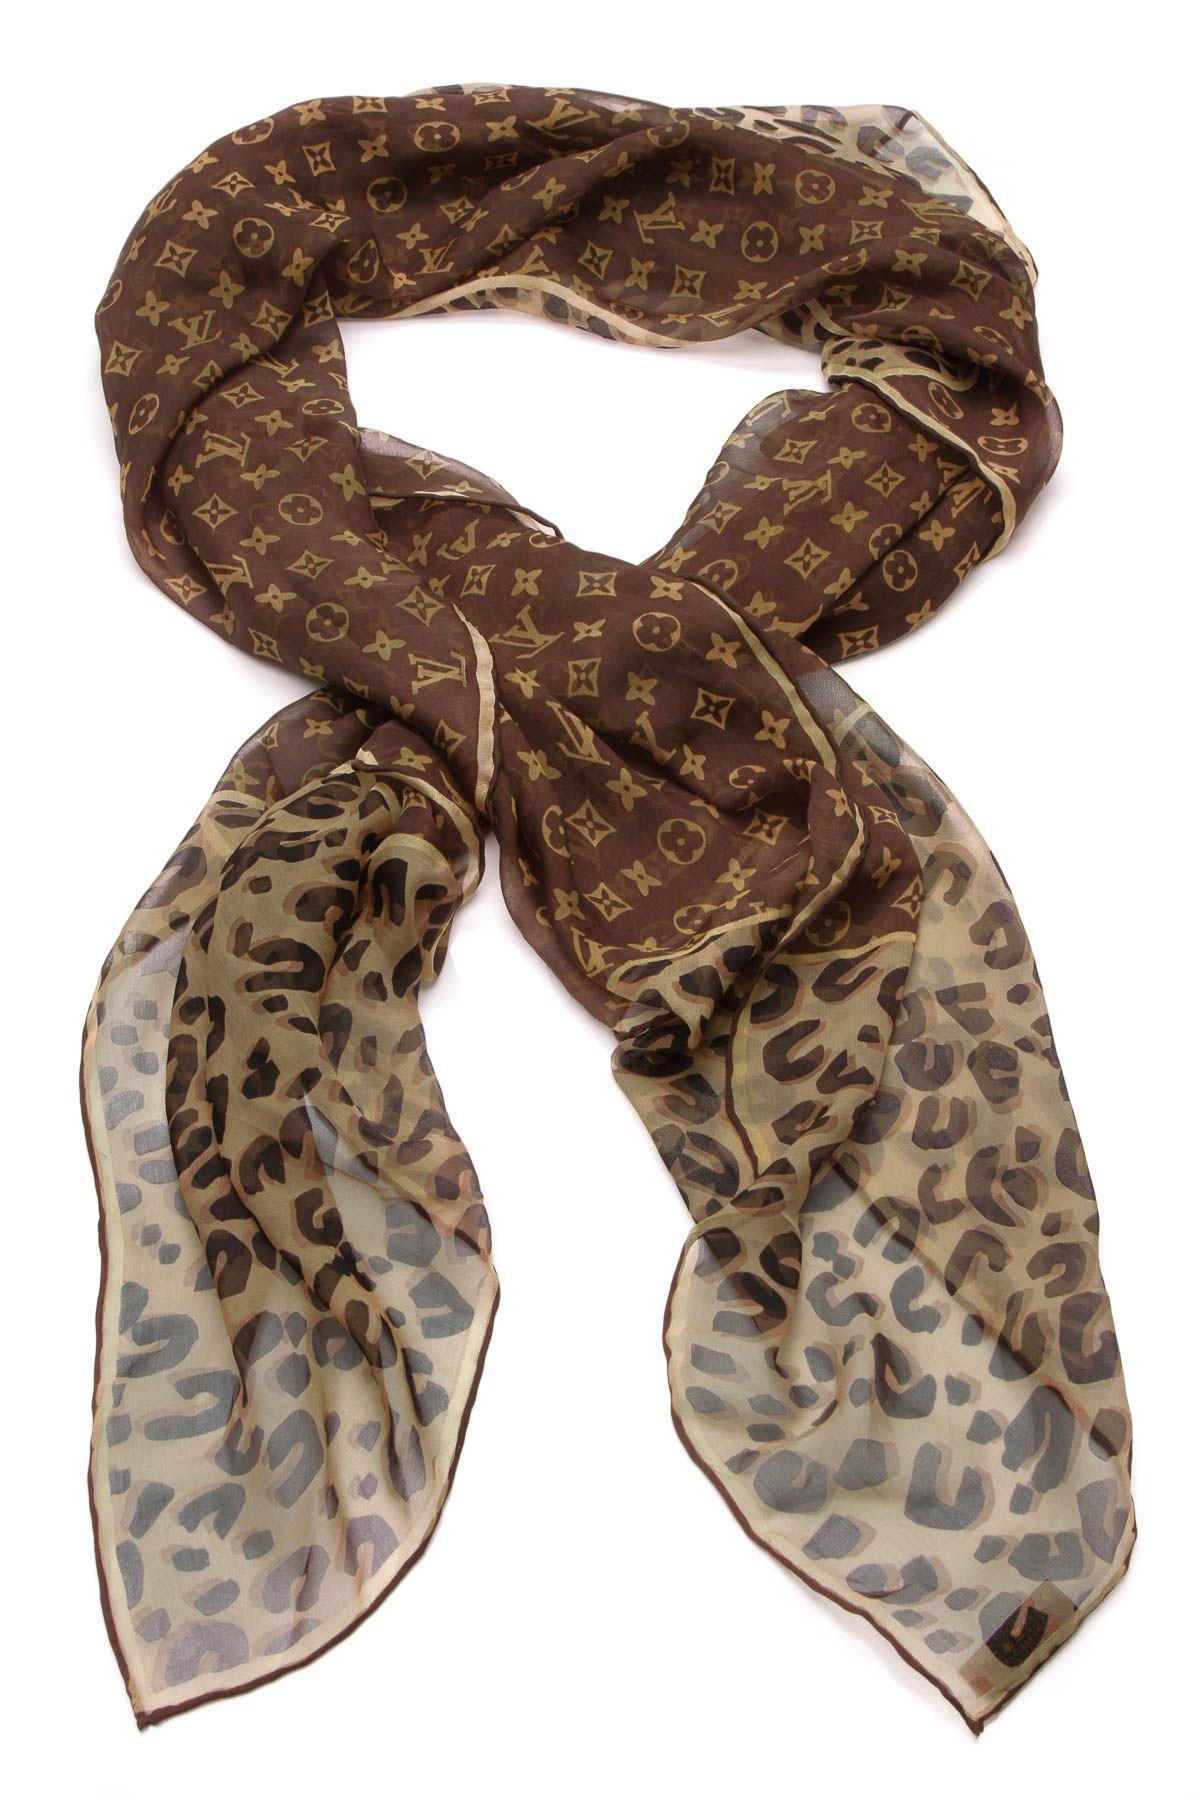 6a6c41eca57 Stephen Sprouse Monogram Leopard Scarf - Silk in 2019